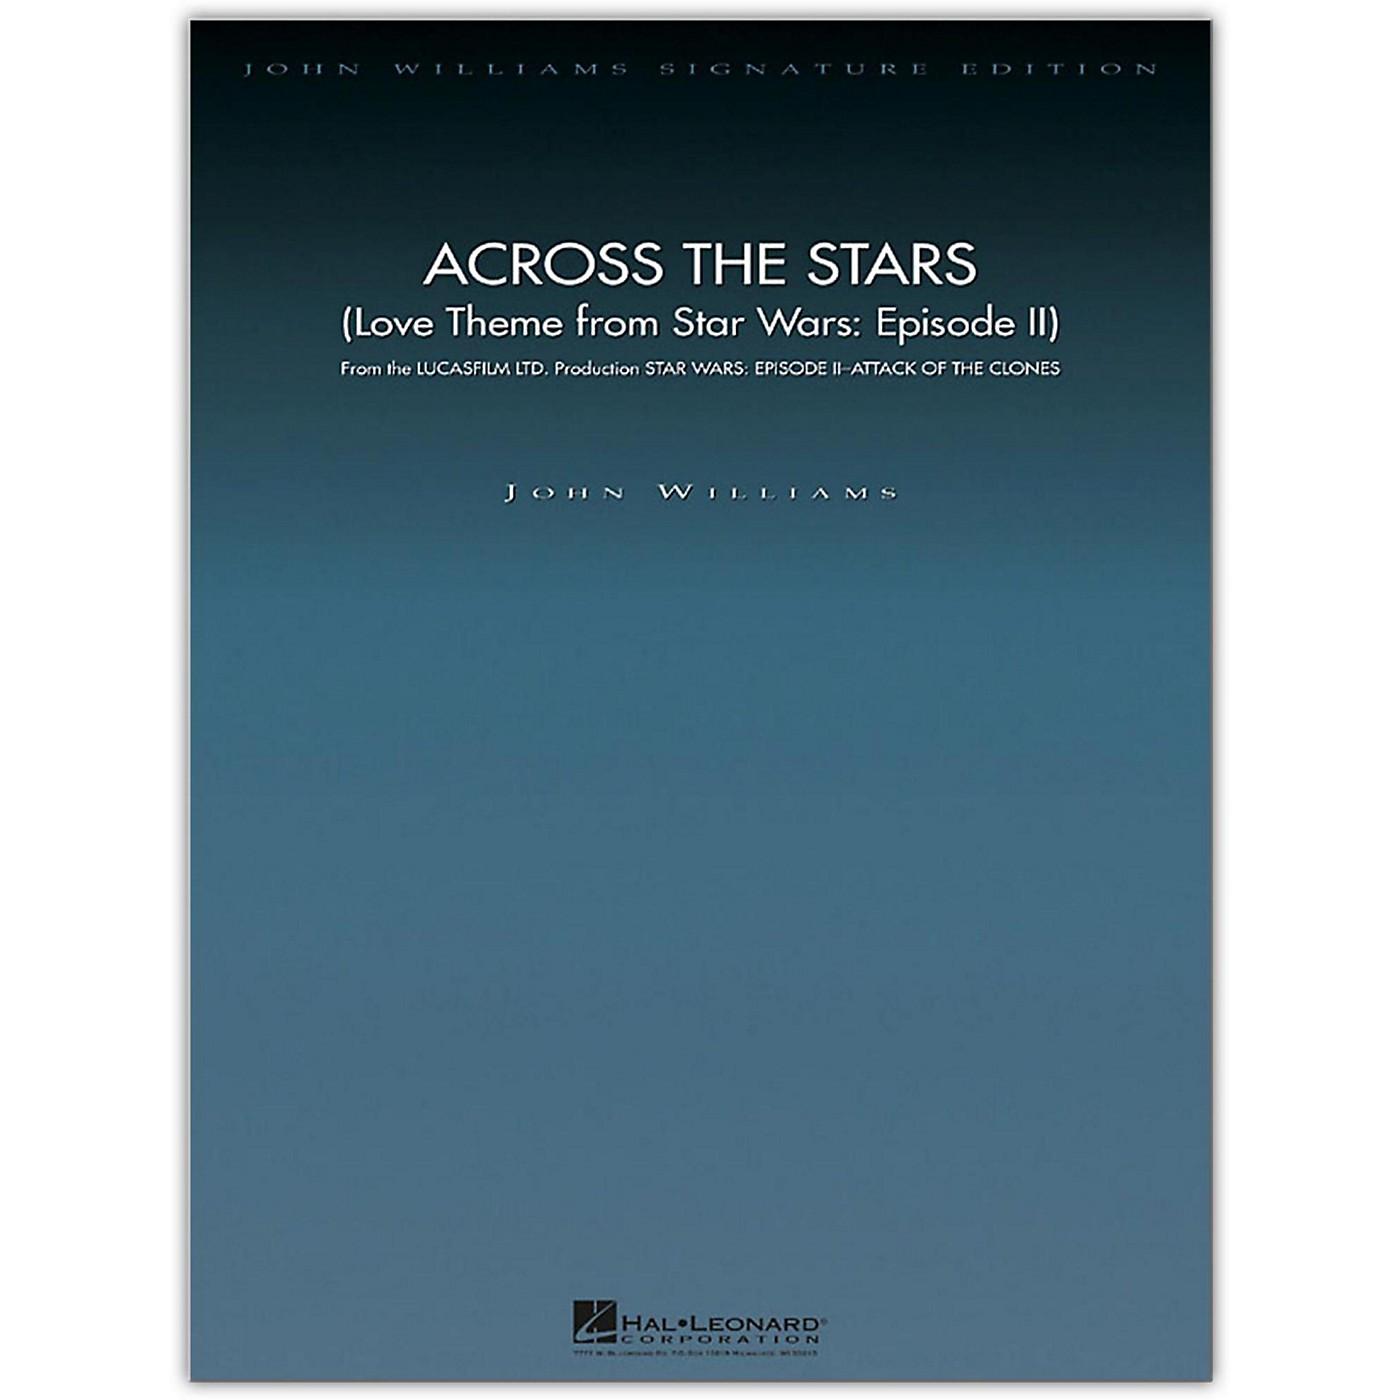 Hal Leonard Across the Stars (Love Theme from Star Wars: Episode II) John Williams Signature Edition Orchestra thumbnail